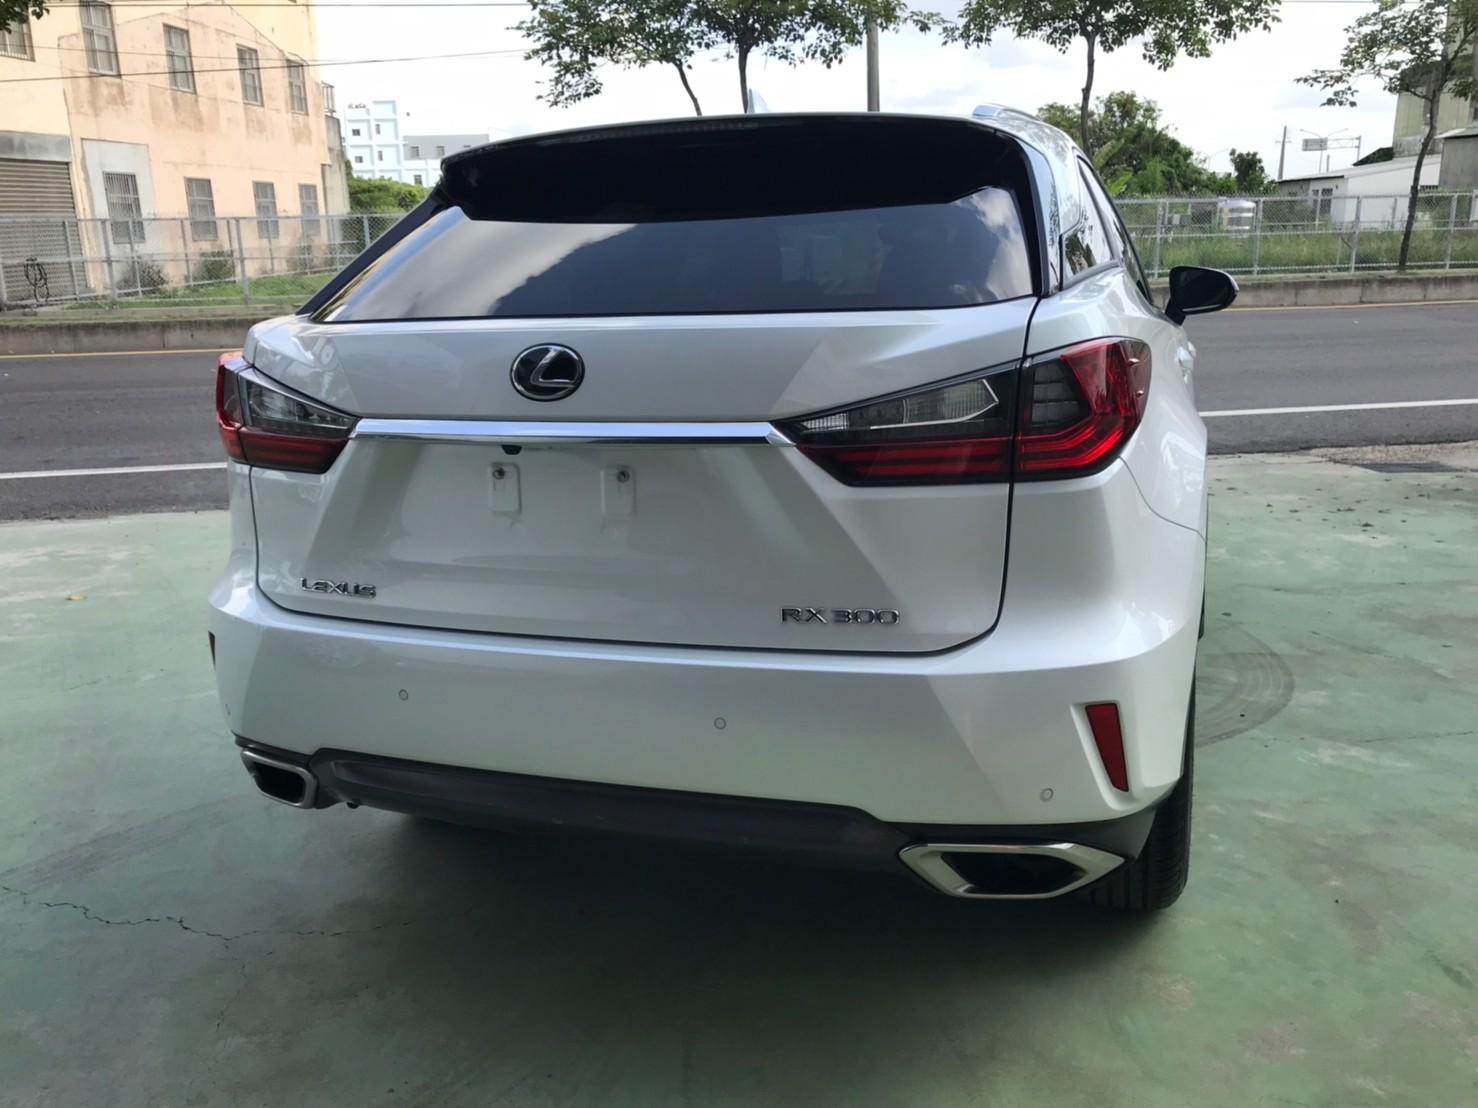 2018RX300白SUM151.8 2.0cc 主動跟車 AEB自動緊急煞車 車道偏離 盲點補助_210620_1